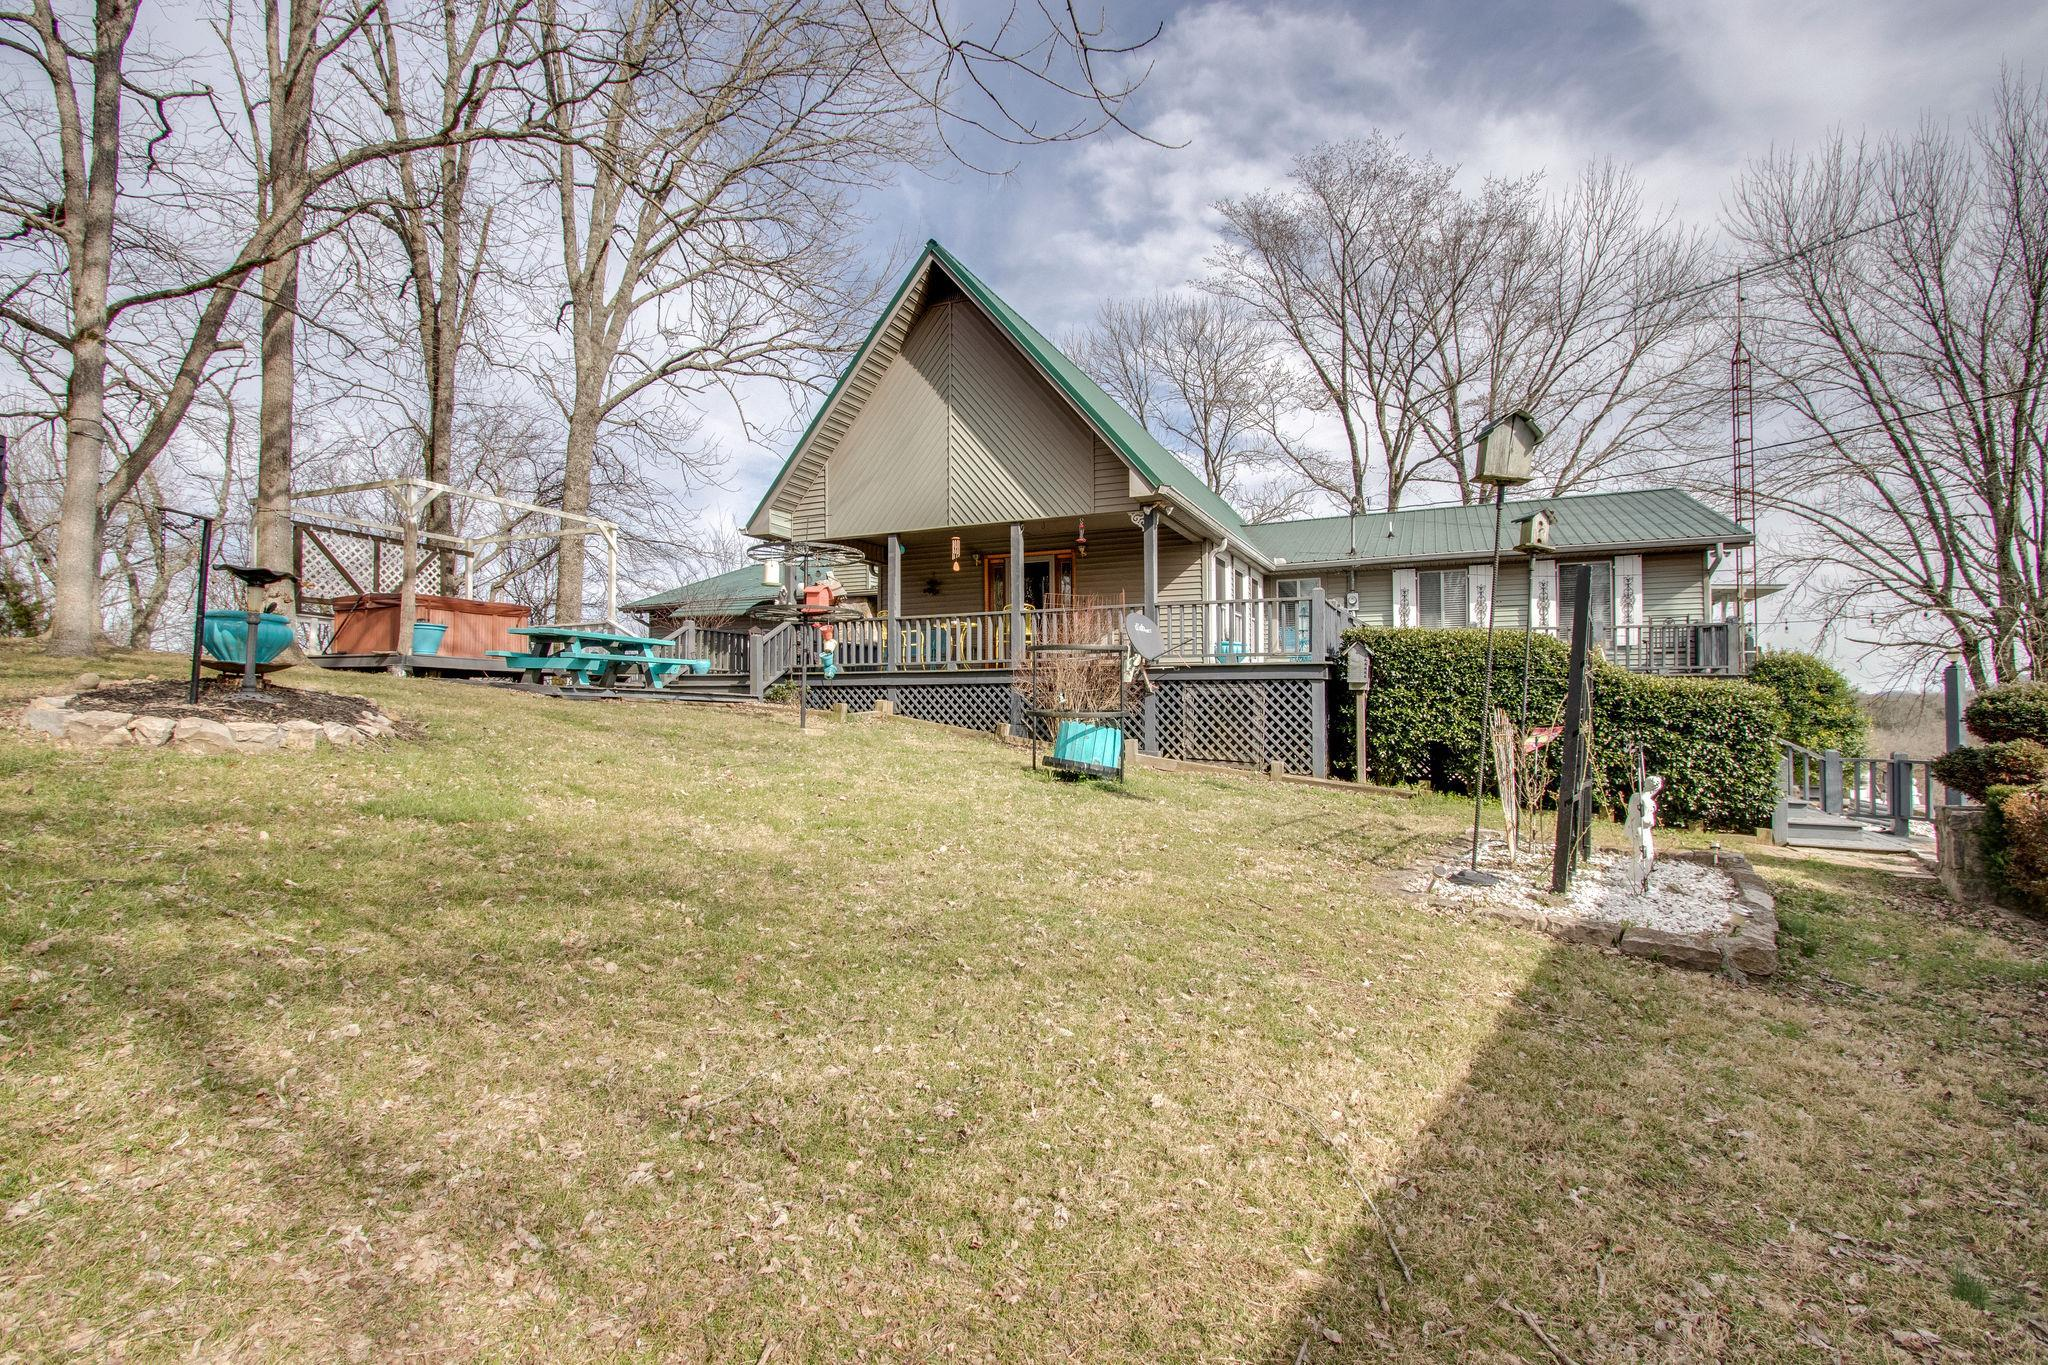 25 Hillview Ln, N, Pleasant Shade, TN 37145 - Pleasant Shade, TN real estate listing